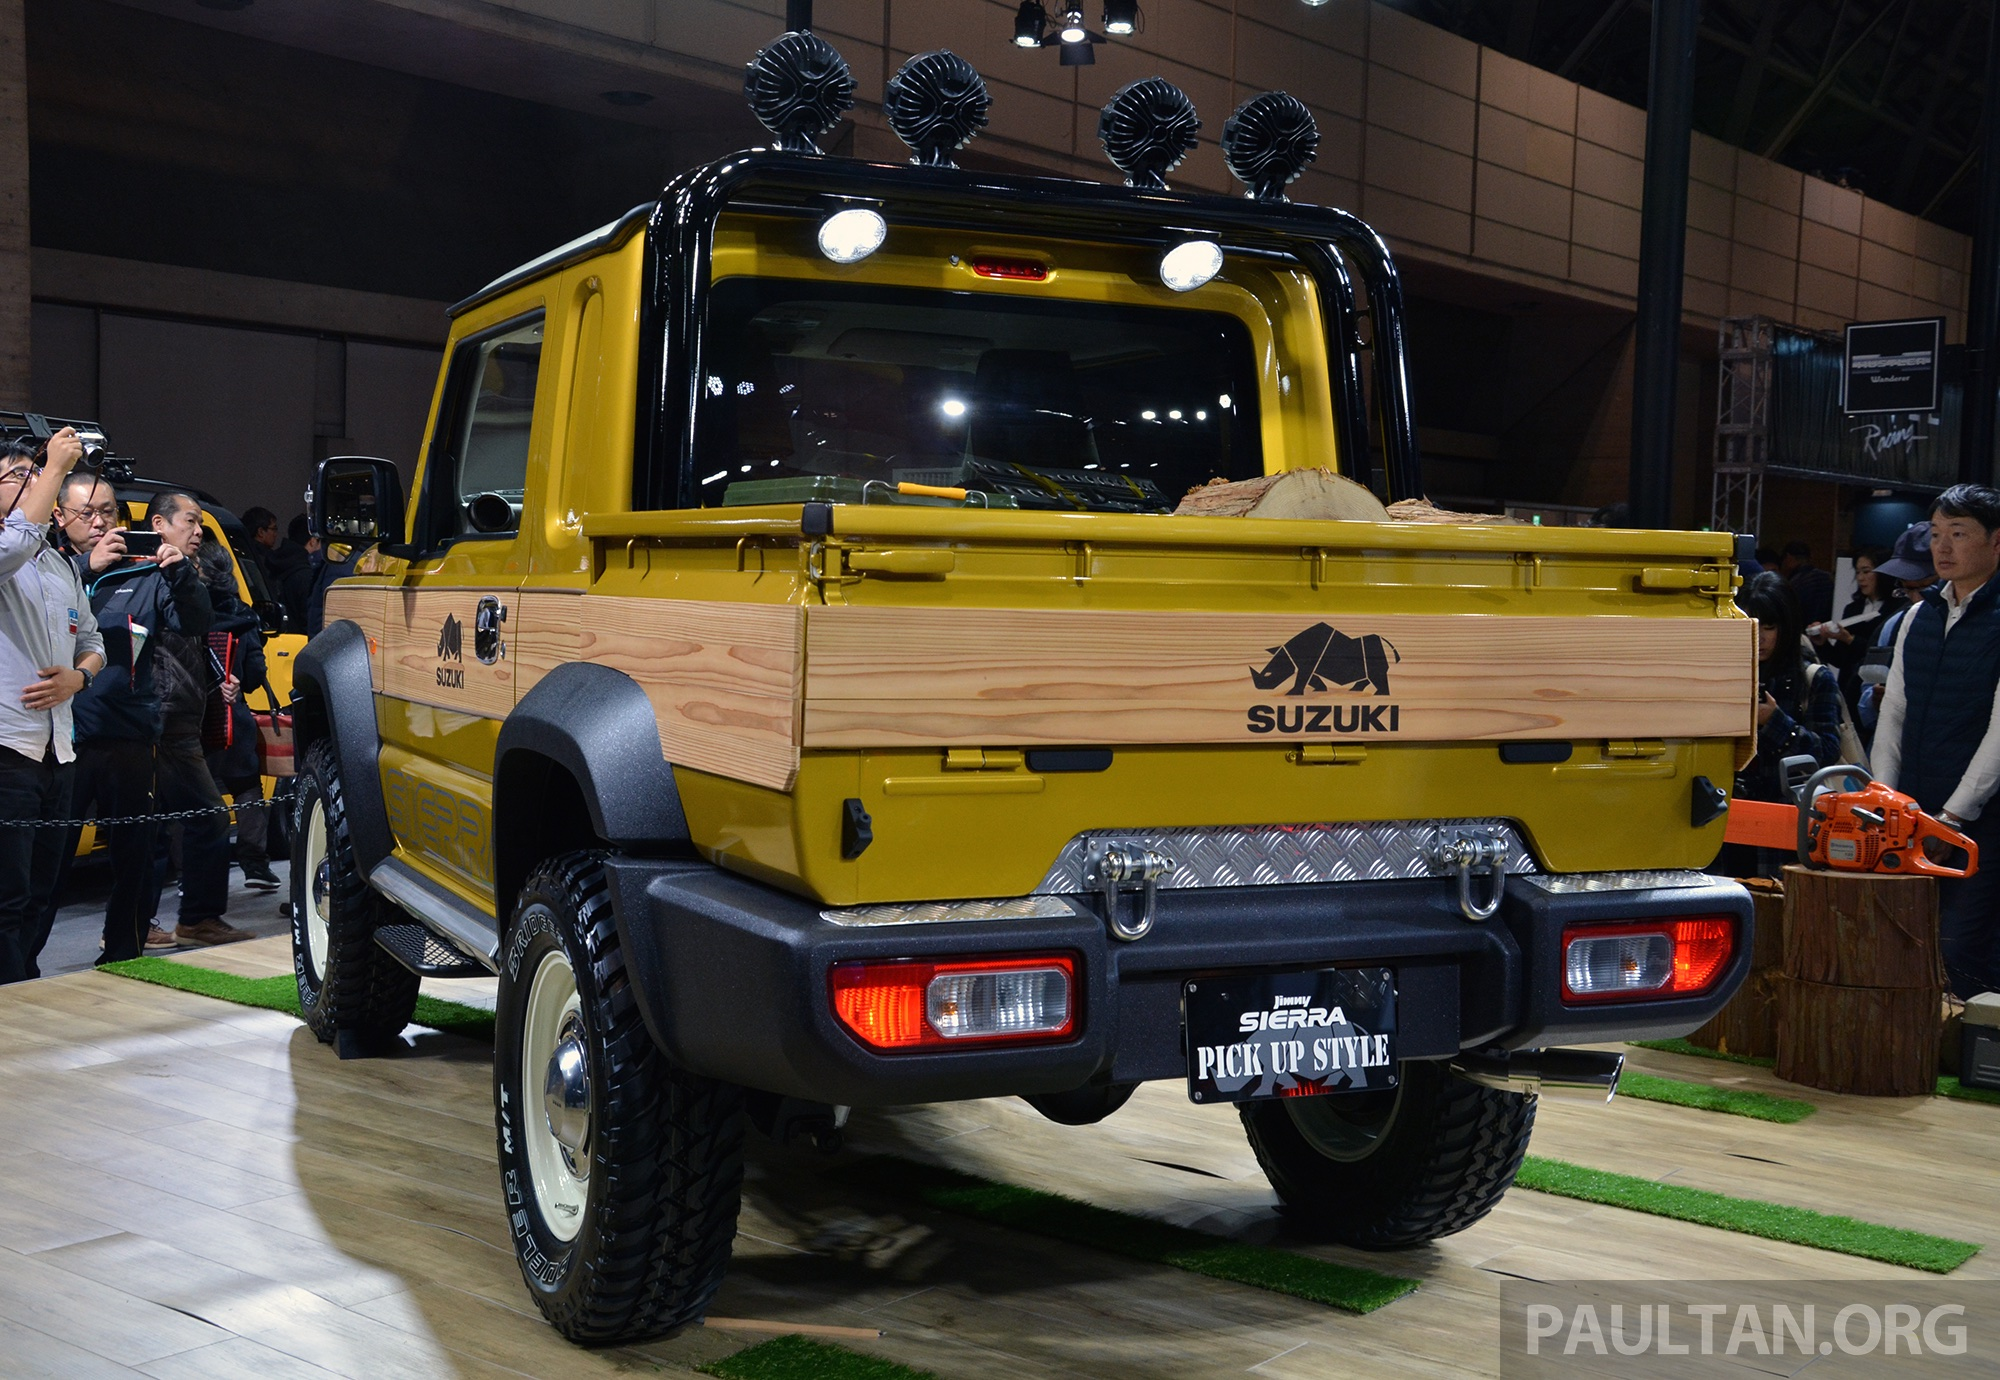 Atemberaubend TAS 2019: Suzuki Jimny Sierra Pick-up Style concept Paul Tan #RR_88